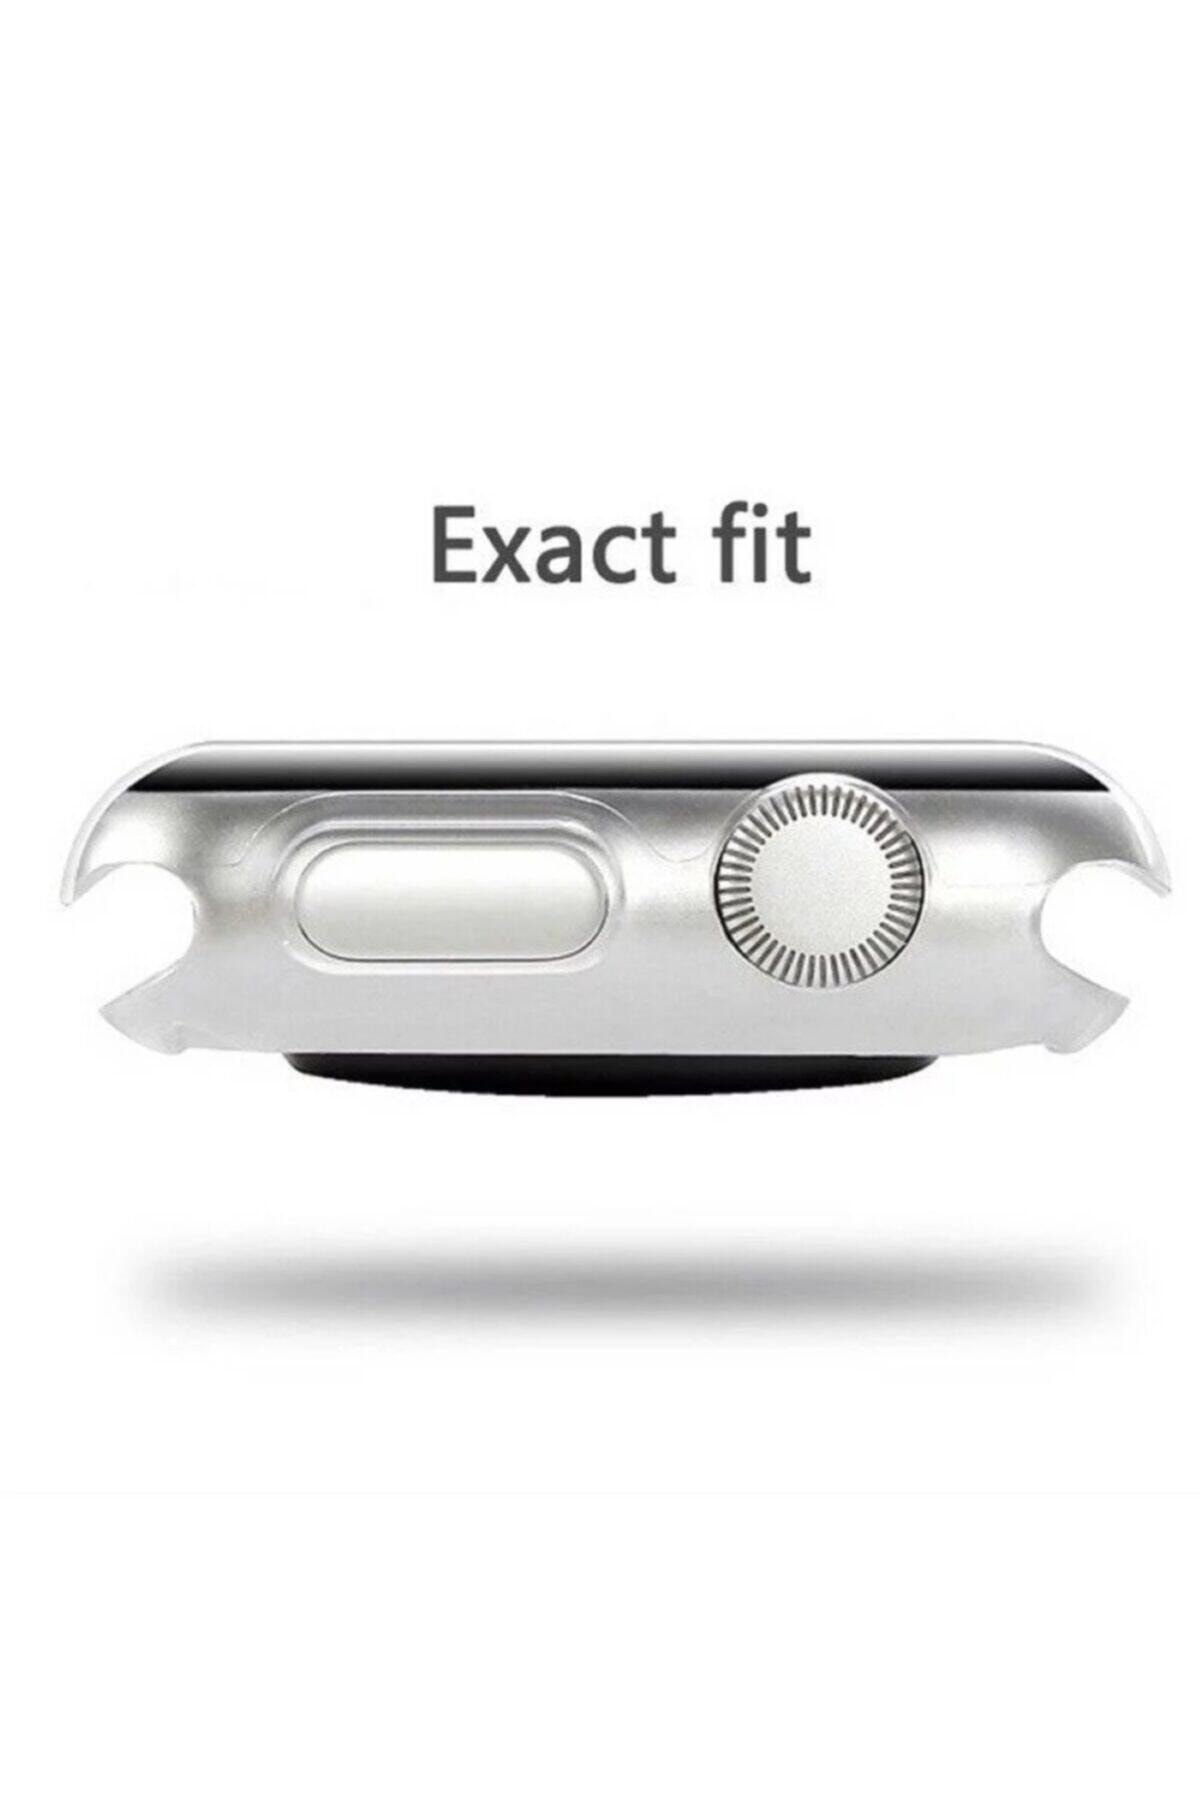 ucuzmi Apple Watch 1 2 3 4 5 6 Se Serisi ( 44mm ) 360 Tam Koruma Şeffaf Silikon Kılıf Premium Model 2